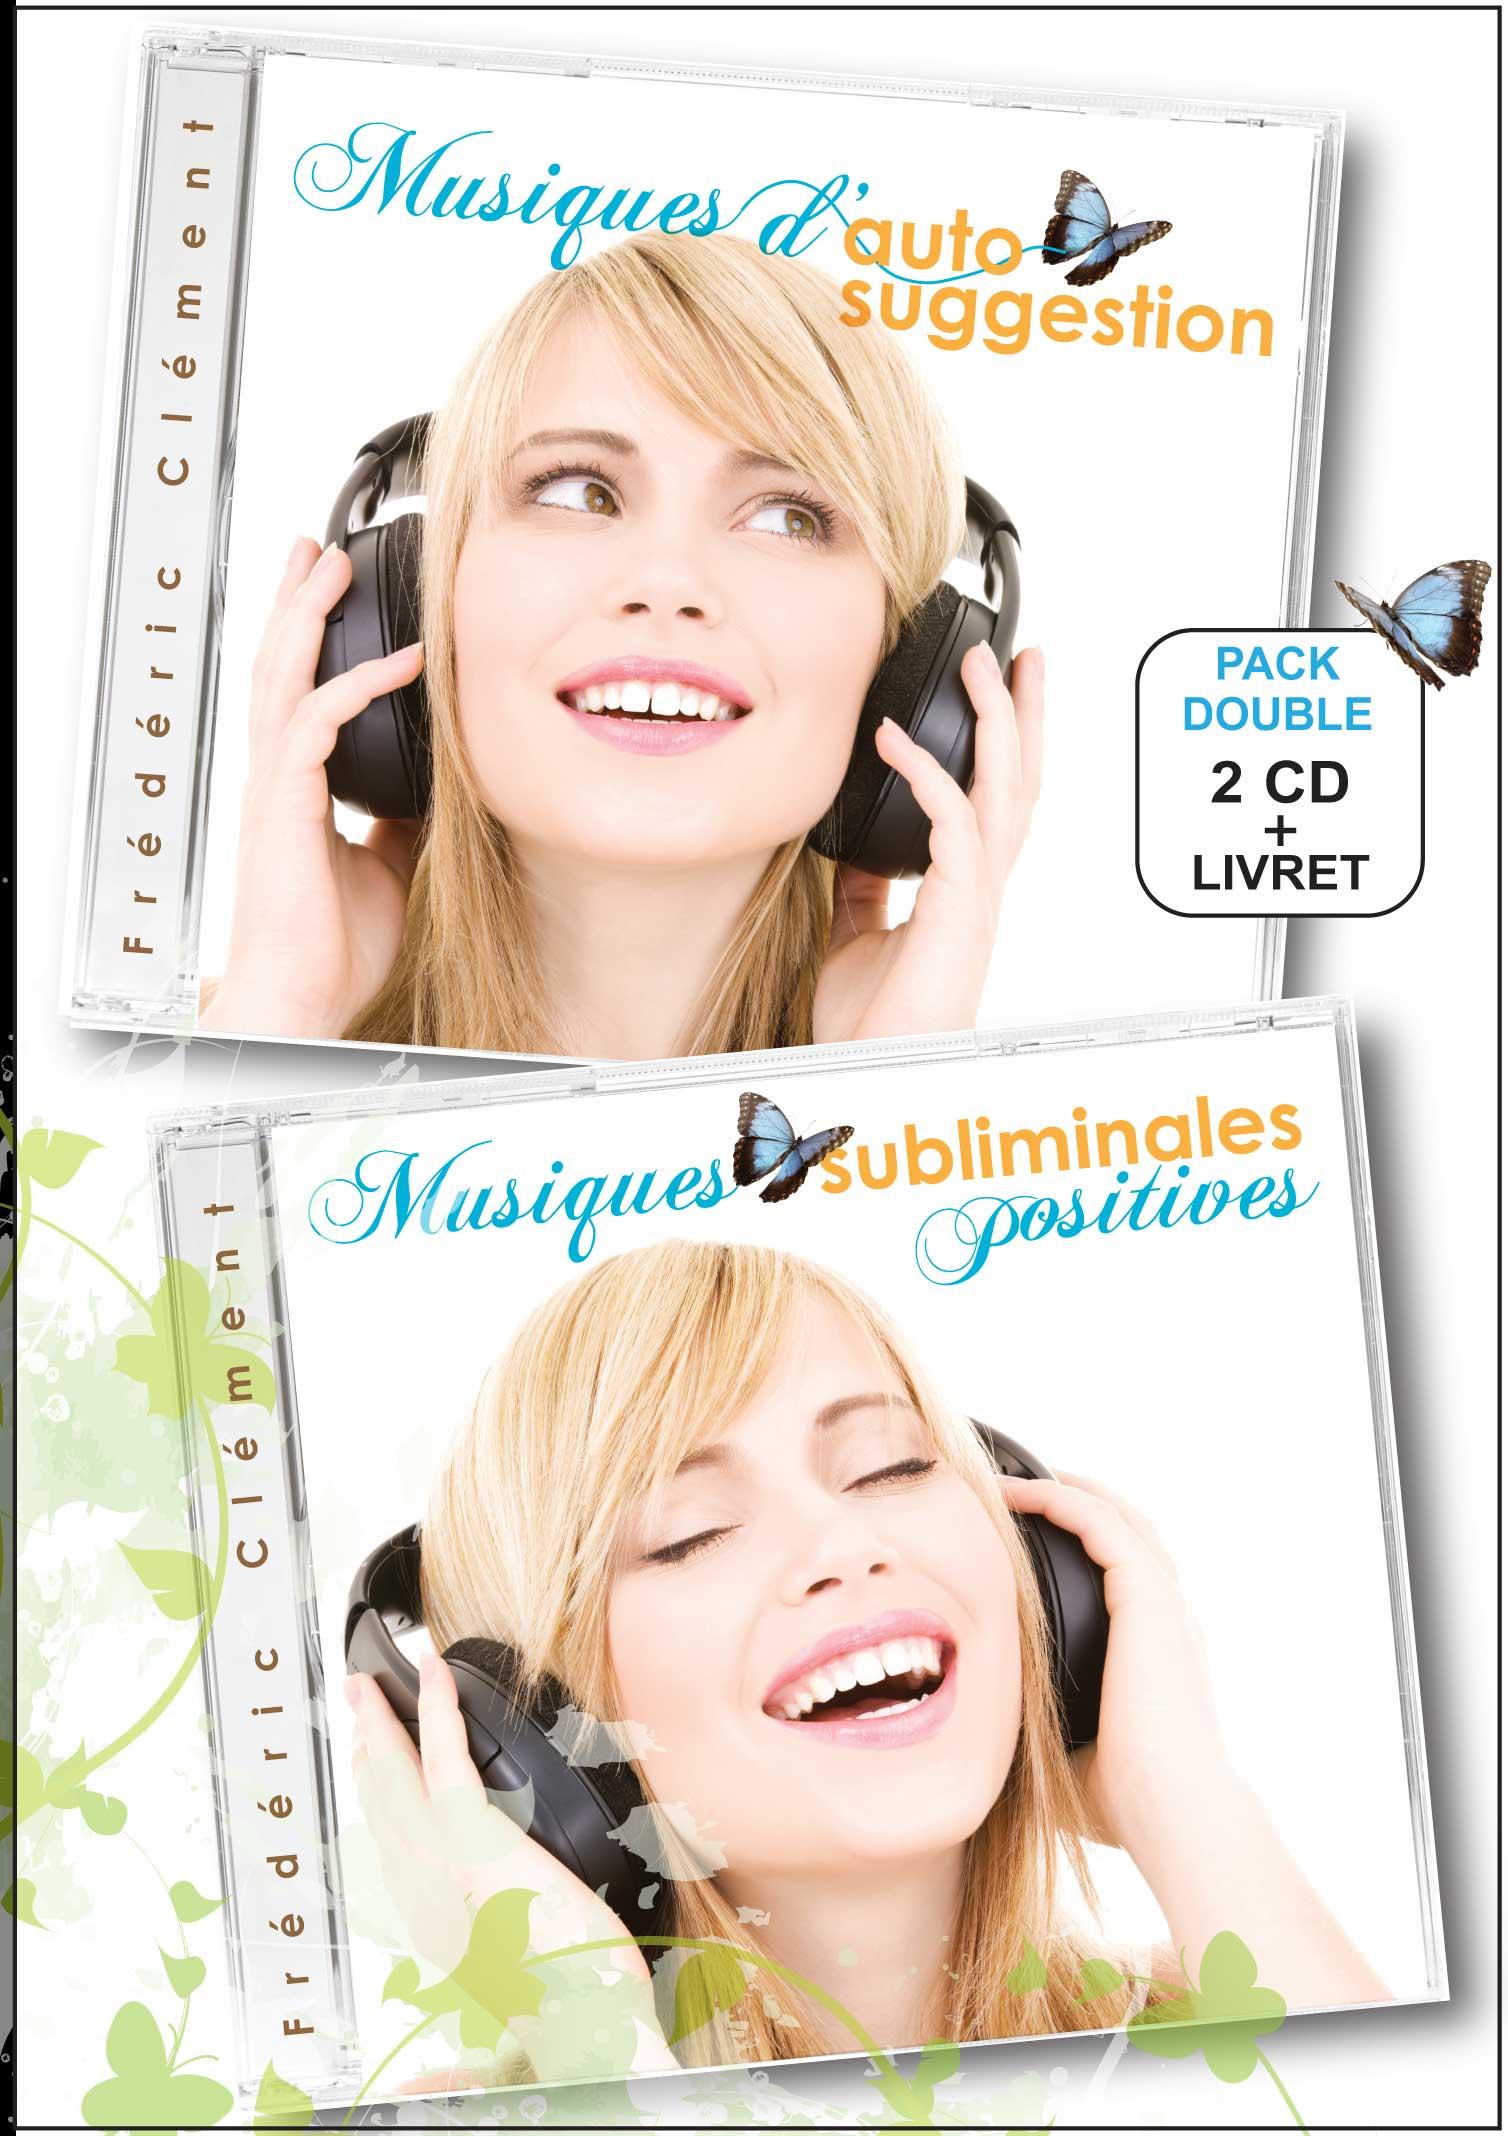 DVD---pack-double_noblue_WEB.jpg